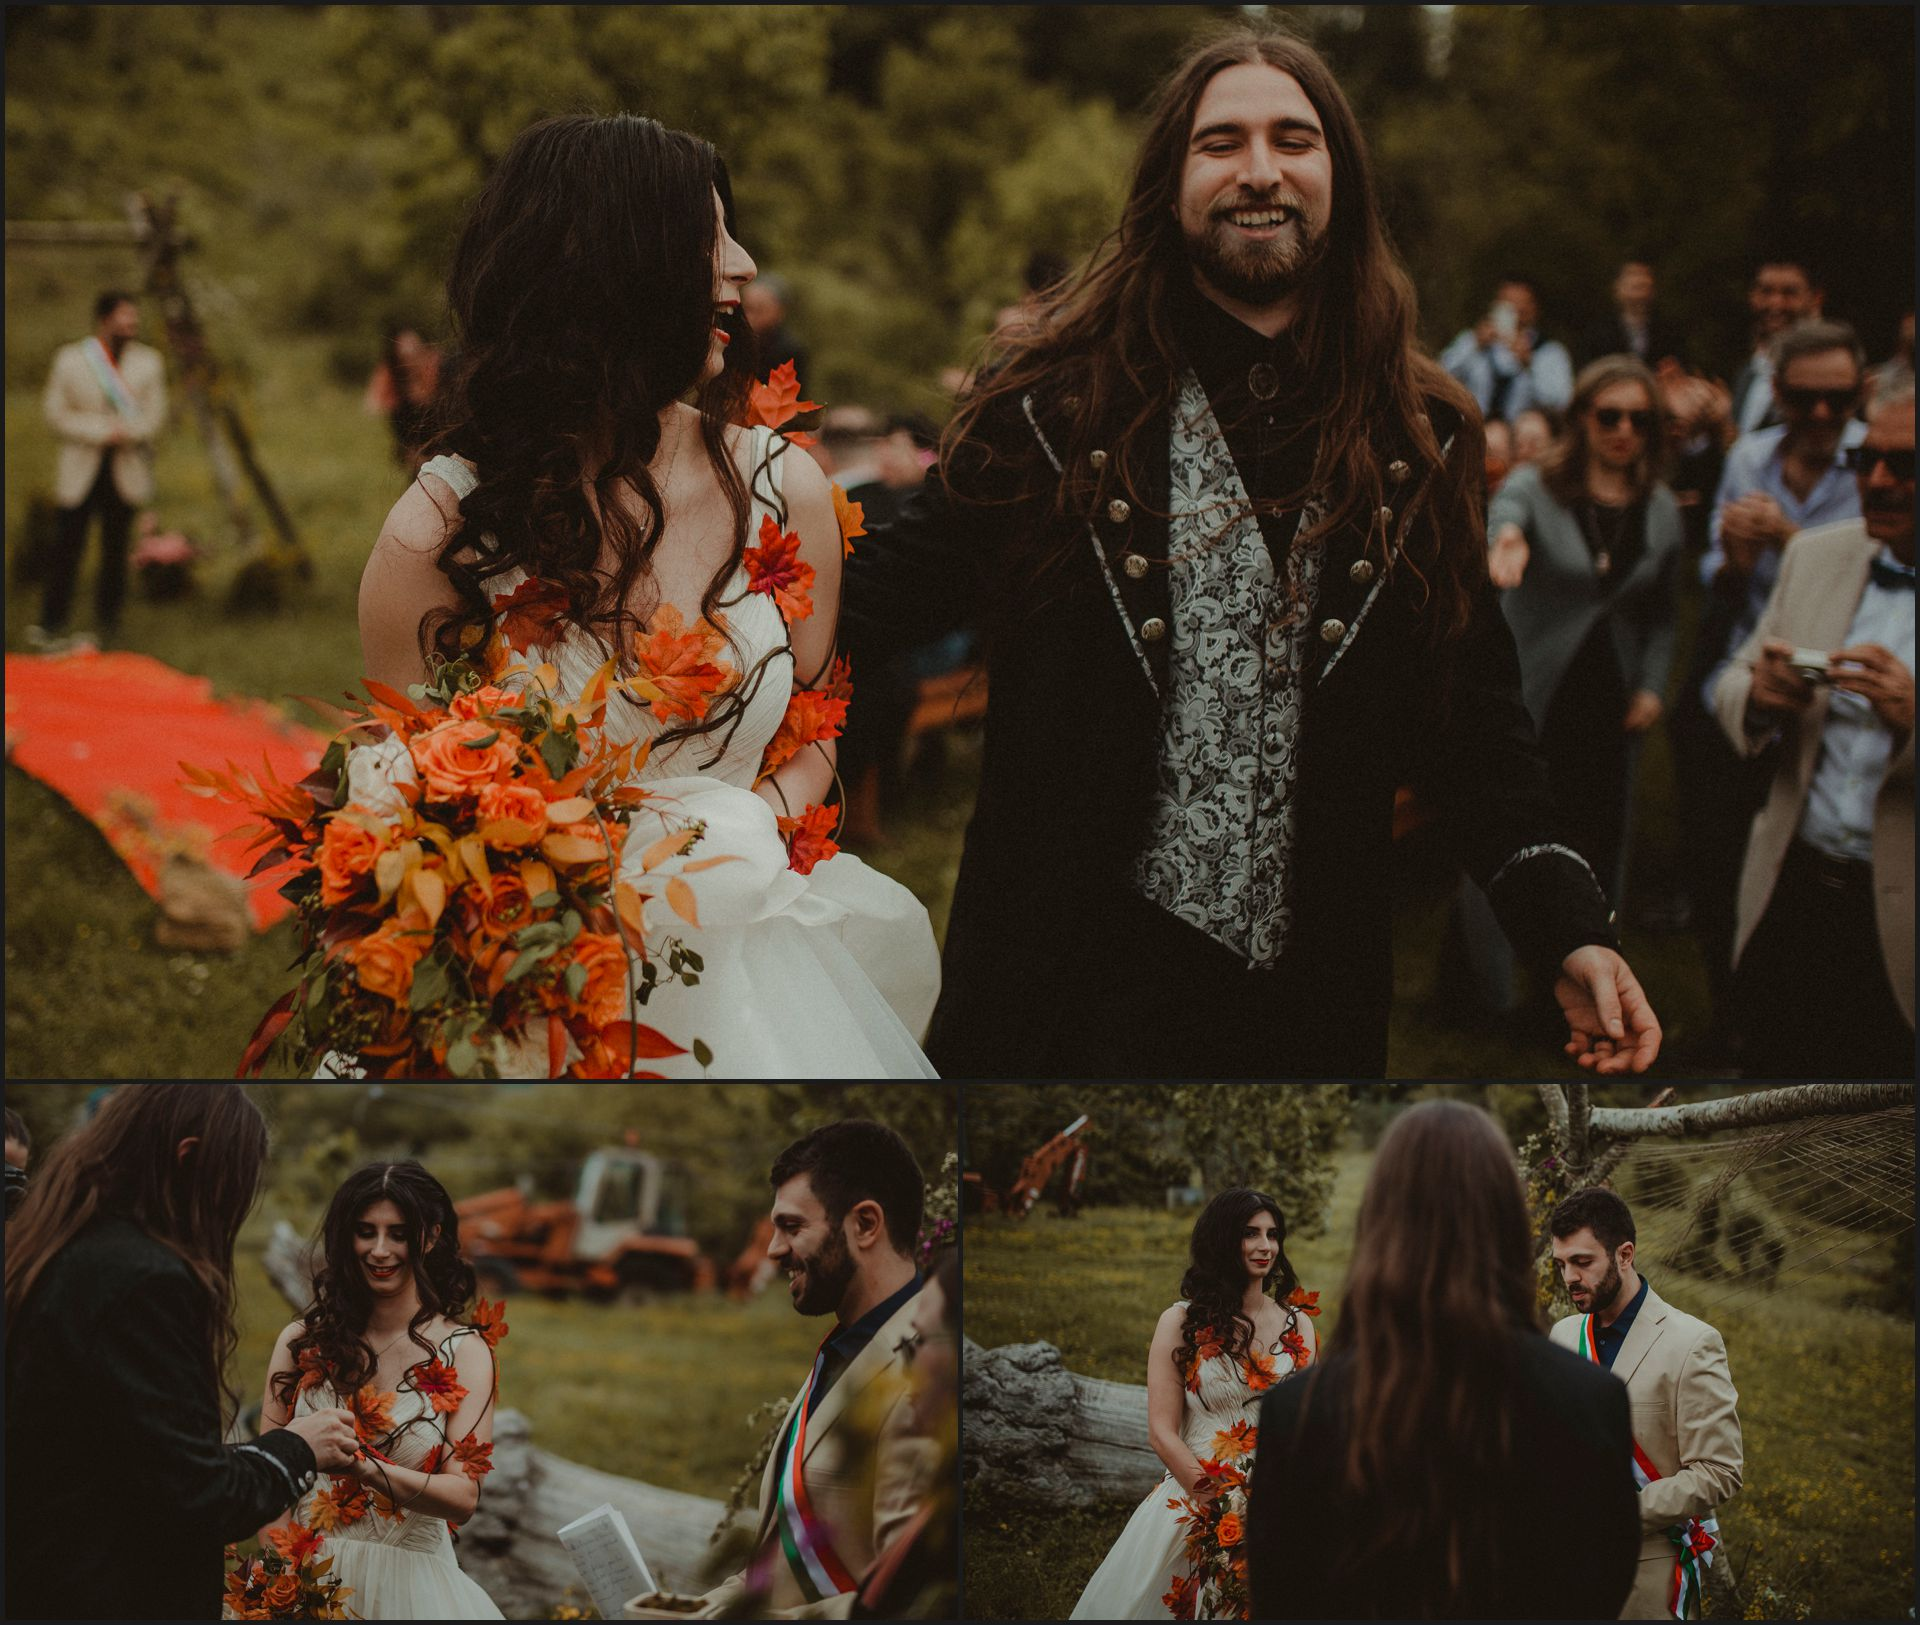 tuscany, alternative wedding, rustic wedding, bride, groom